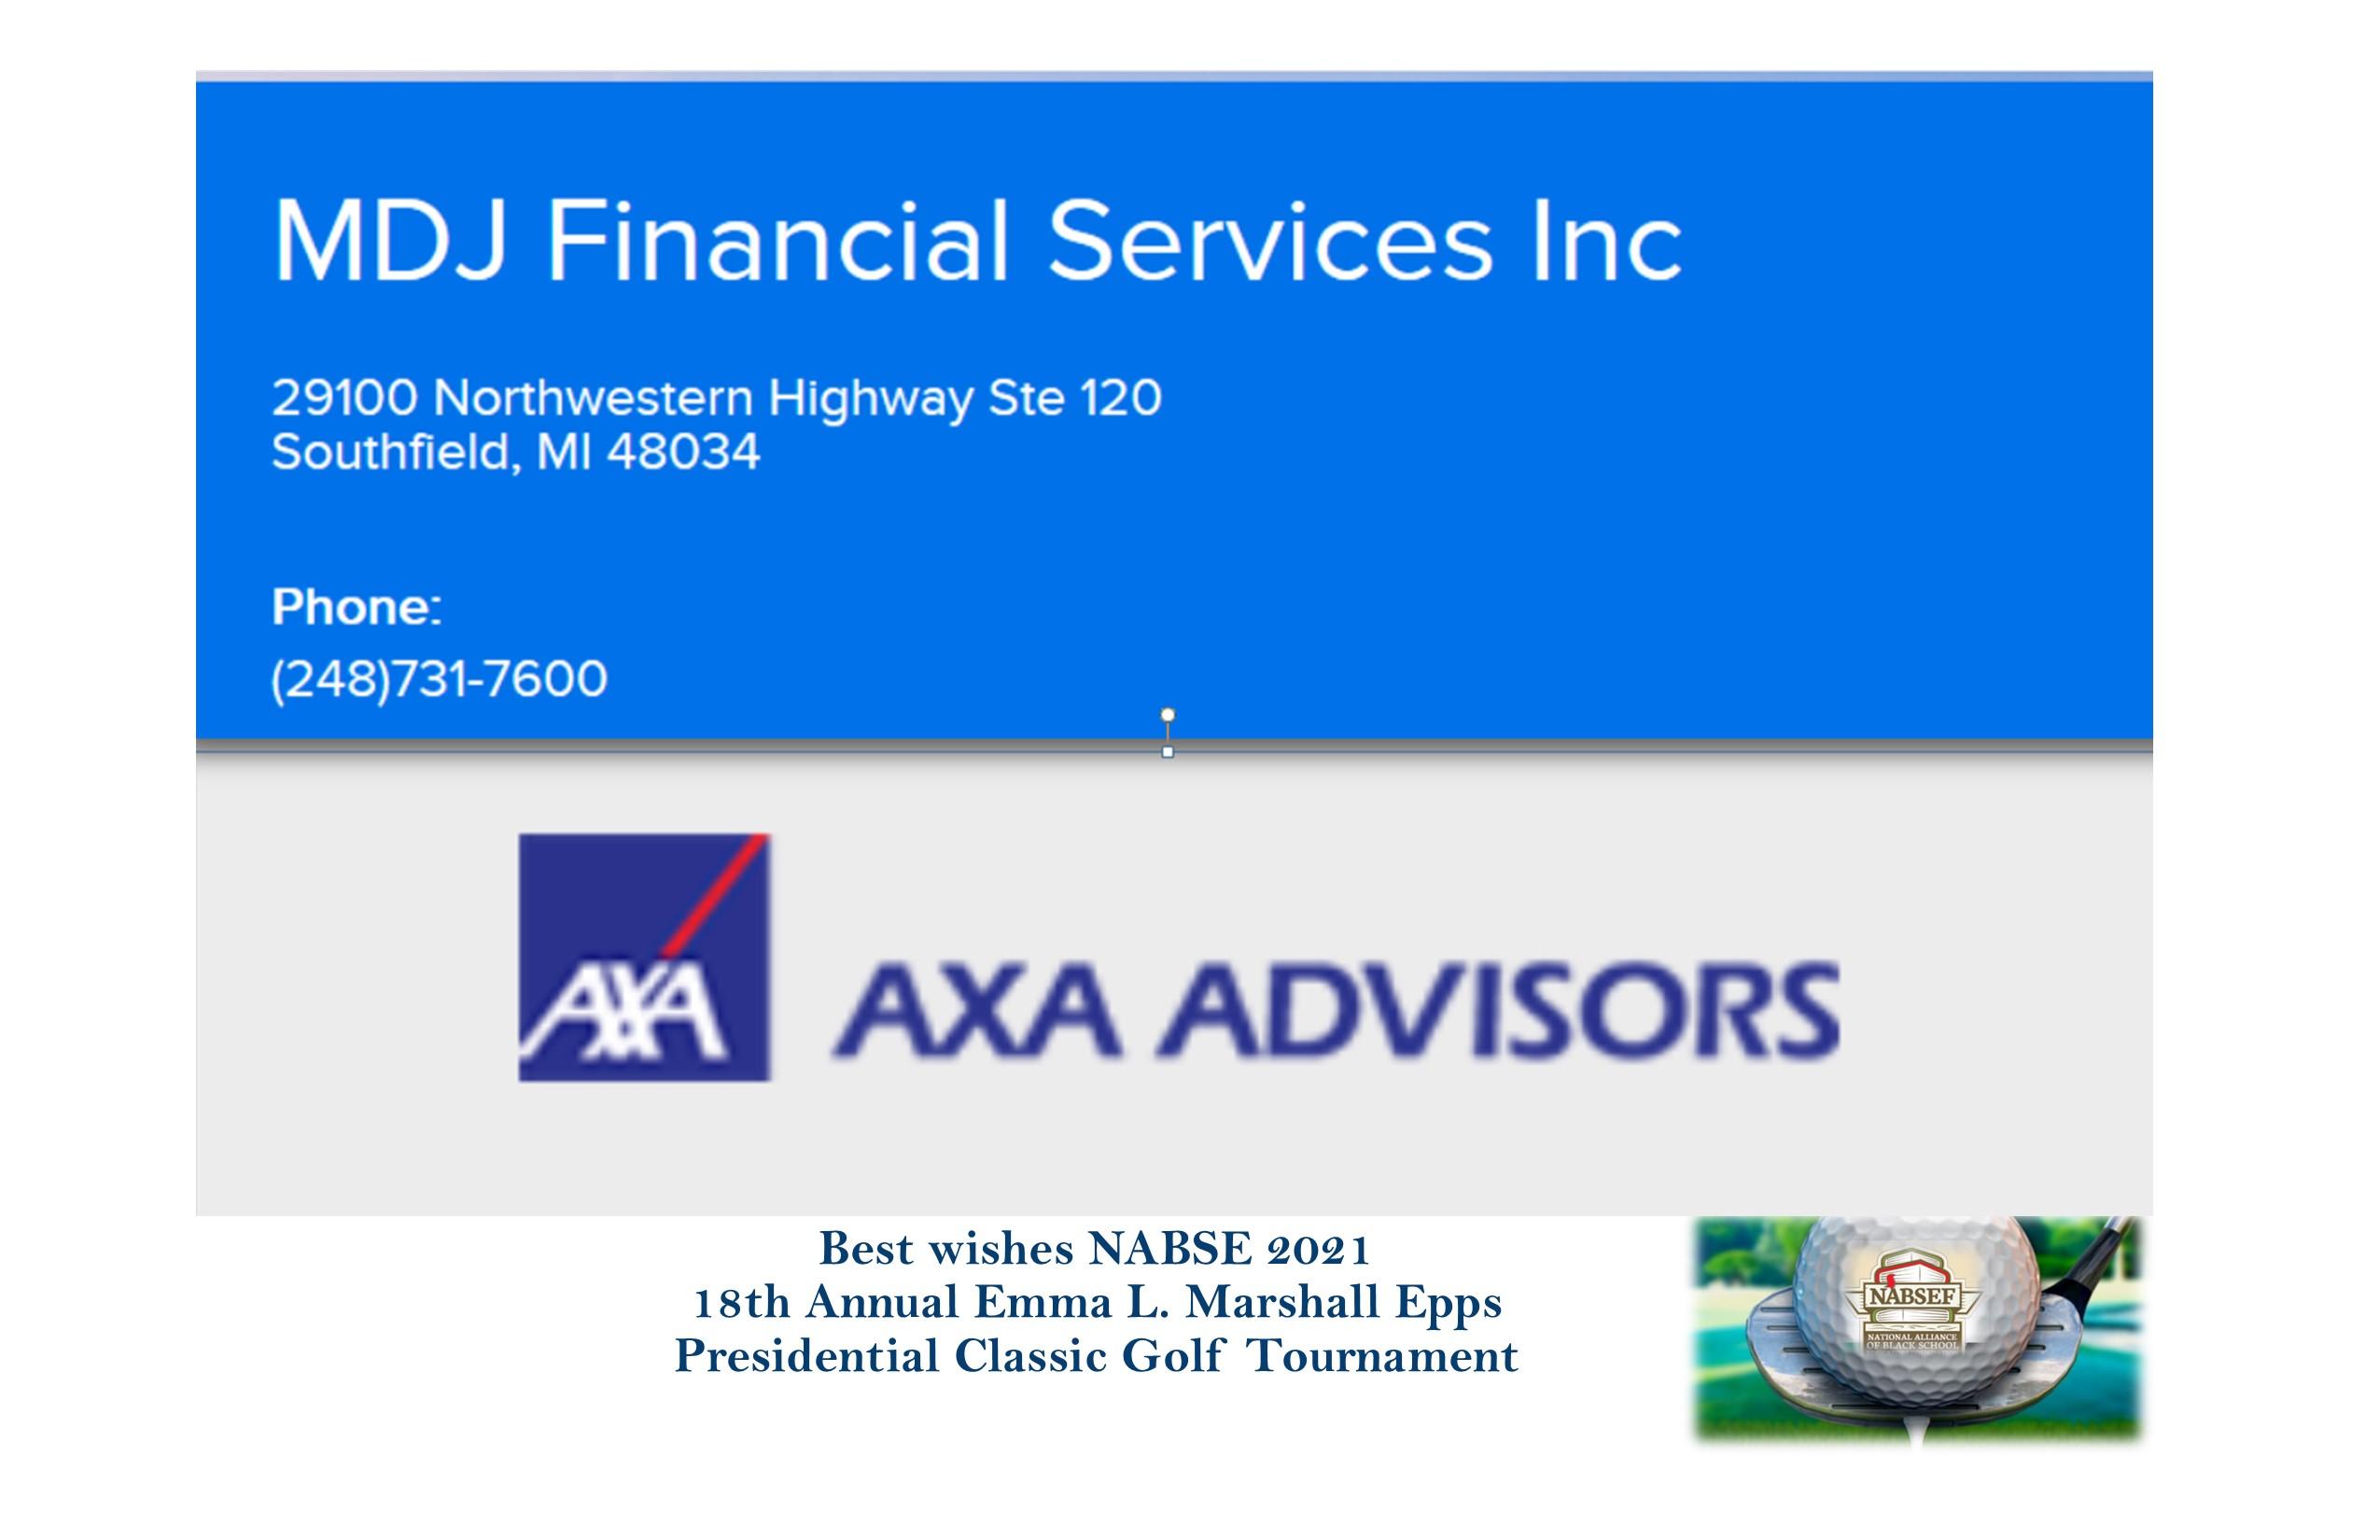 MDJ Financial Services